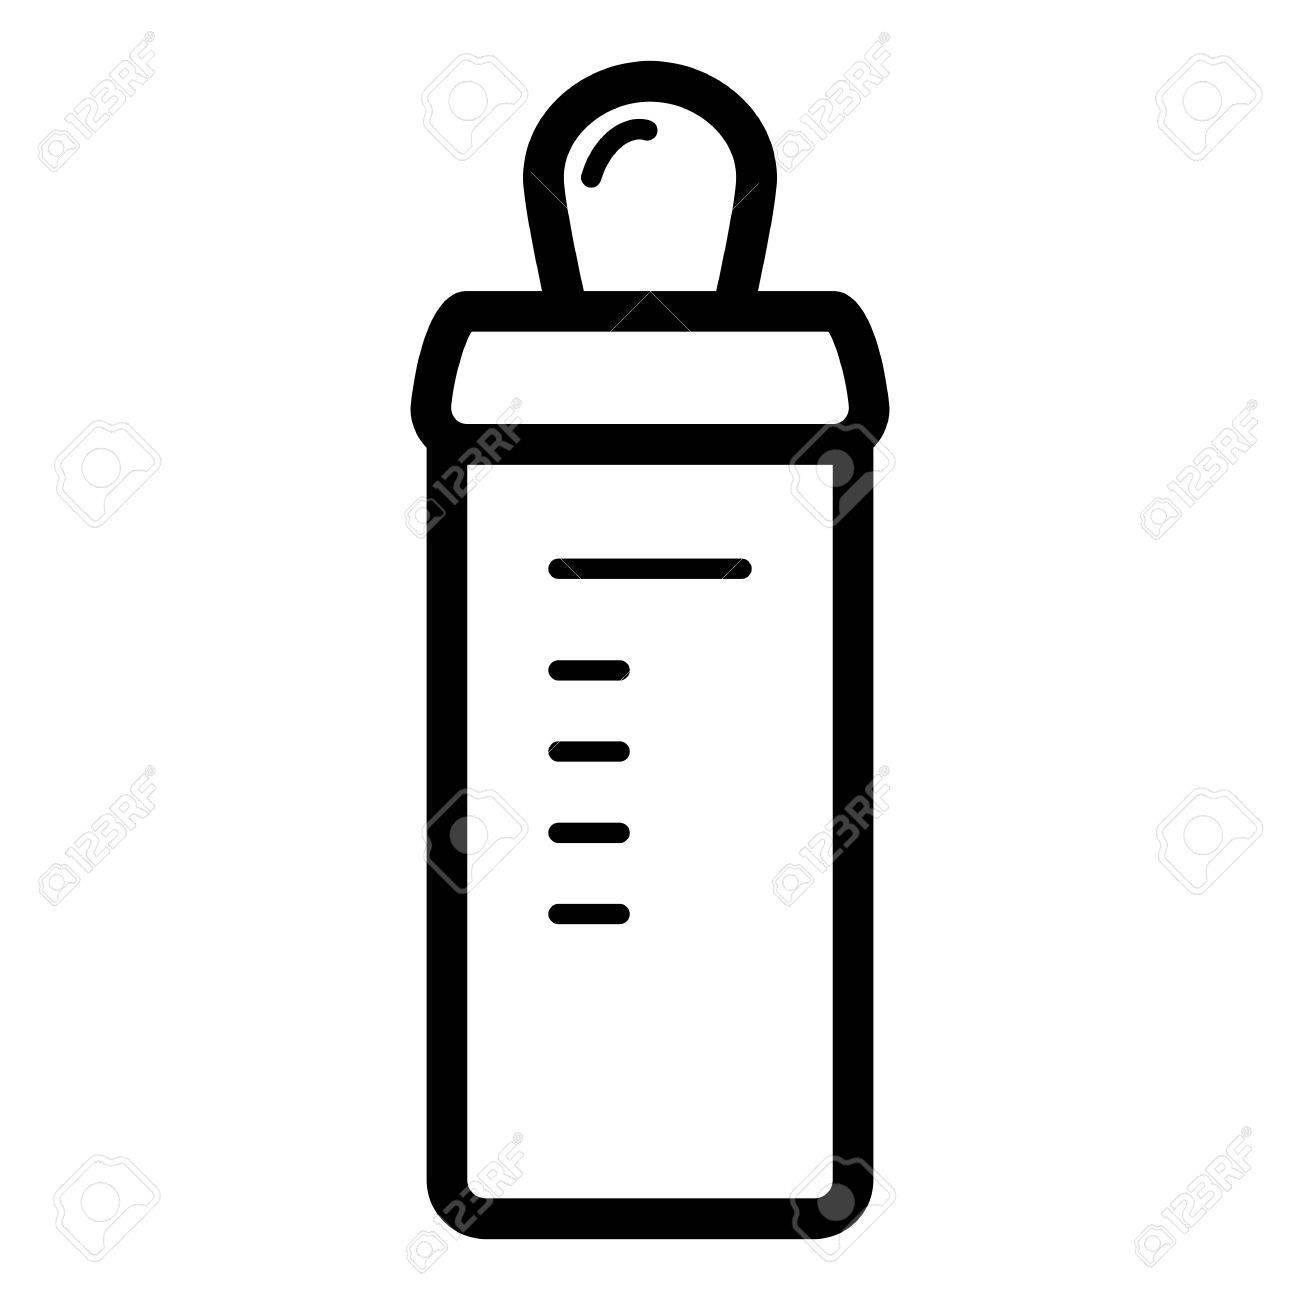 baby bottle vector icon black and white baby nipple illustration rh 123rf com baby bottle vector image baby milk bottle vector